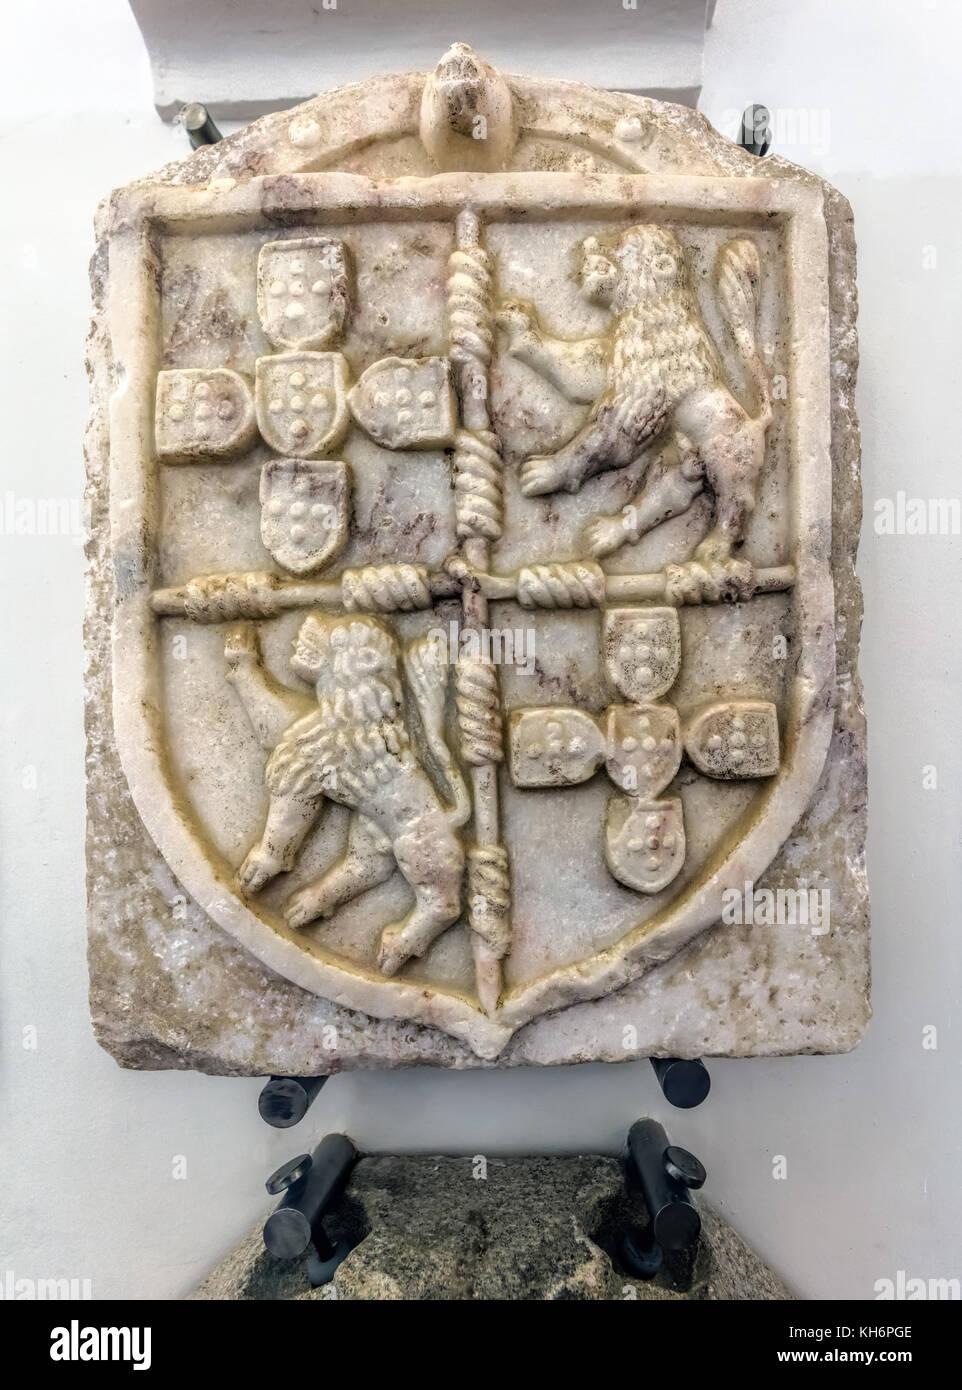 Evora Museum in Evora, Portugal. Marble Coat of Arms of Sousas do Prado, early 16th century. - Stock Image